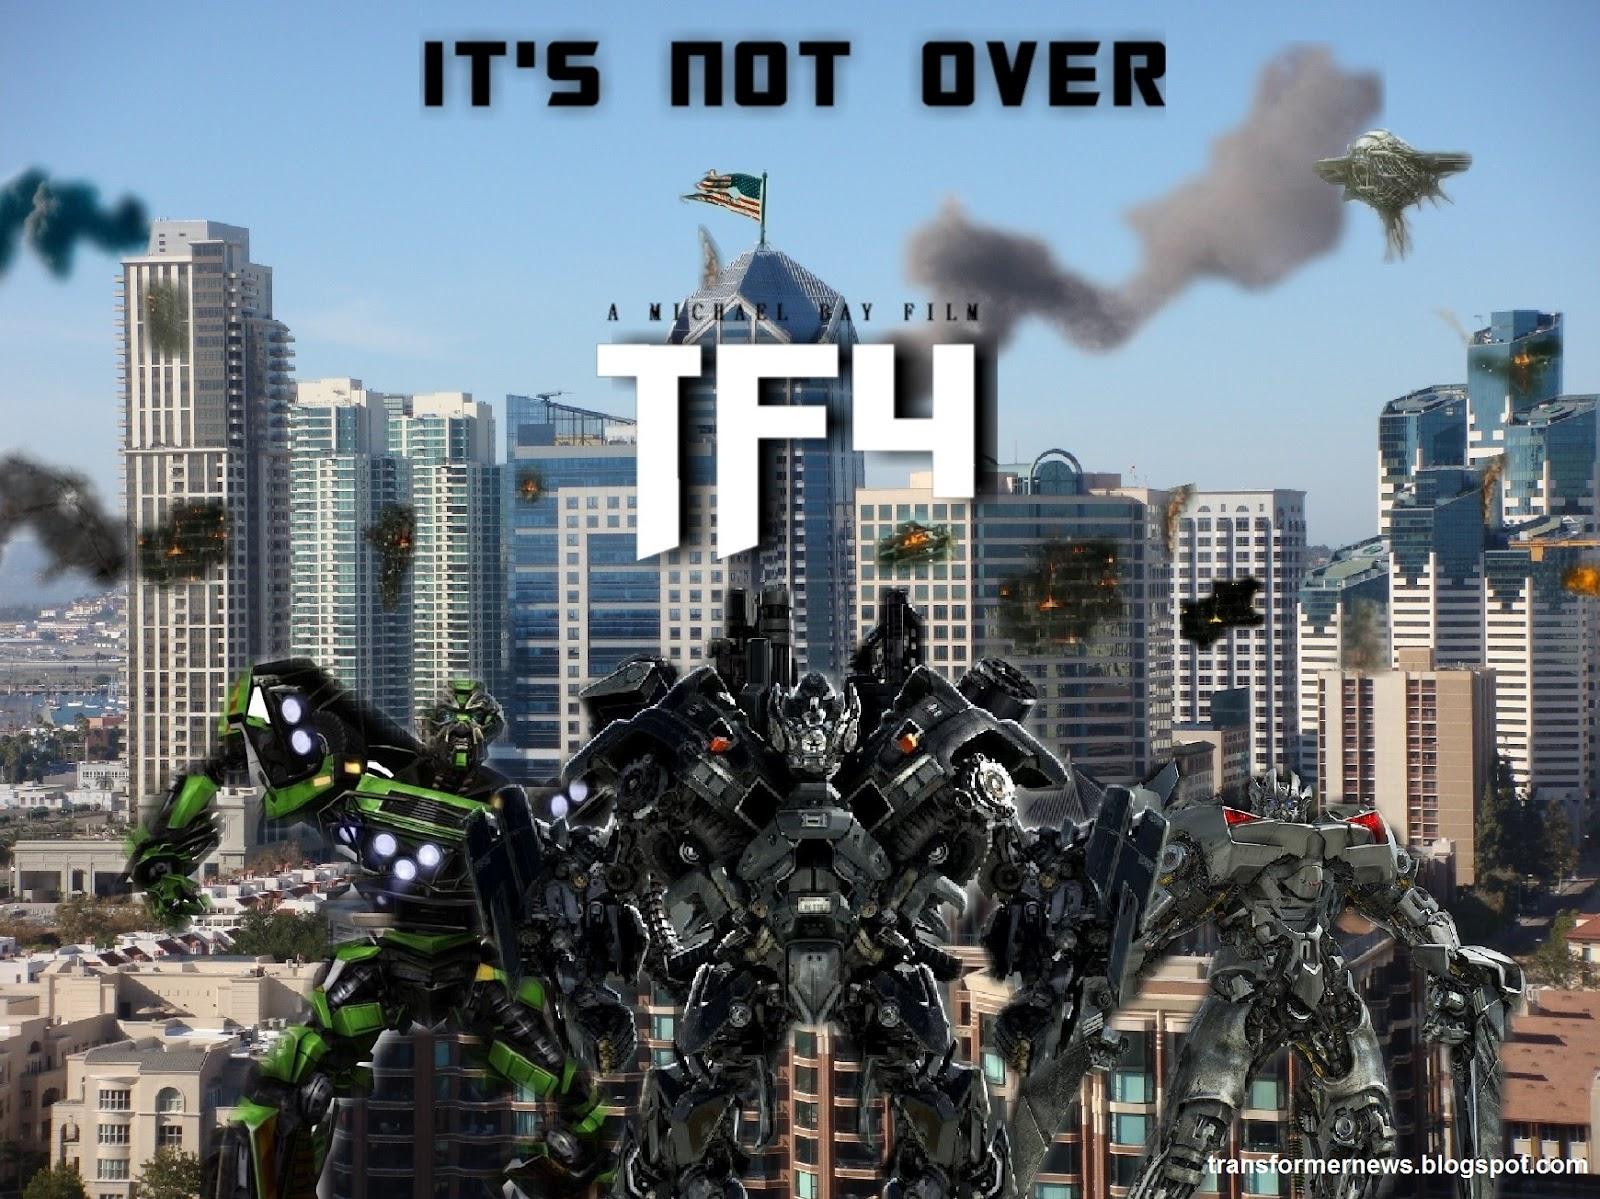 http://3.bp.blogspot.com/-r3EllKjVdts/T5sXaZmvaVI/AAAAAAAABA8/WYsZaBmD1DY/s1600/tf4-autobot-poster.JPG